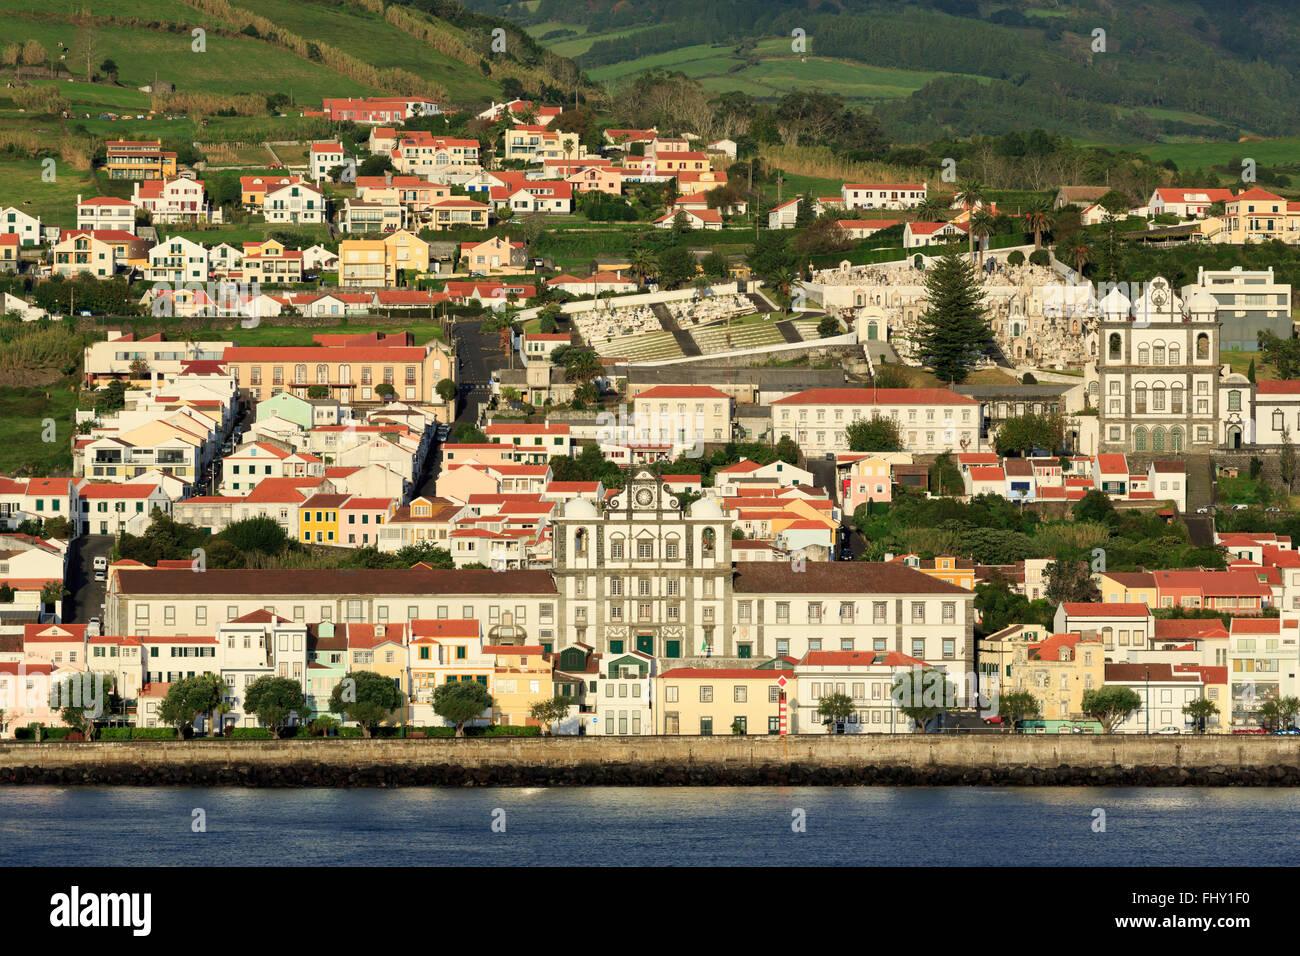 Horta, île de Faial, Açores, Portugal, Europe Photo Stock